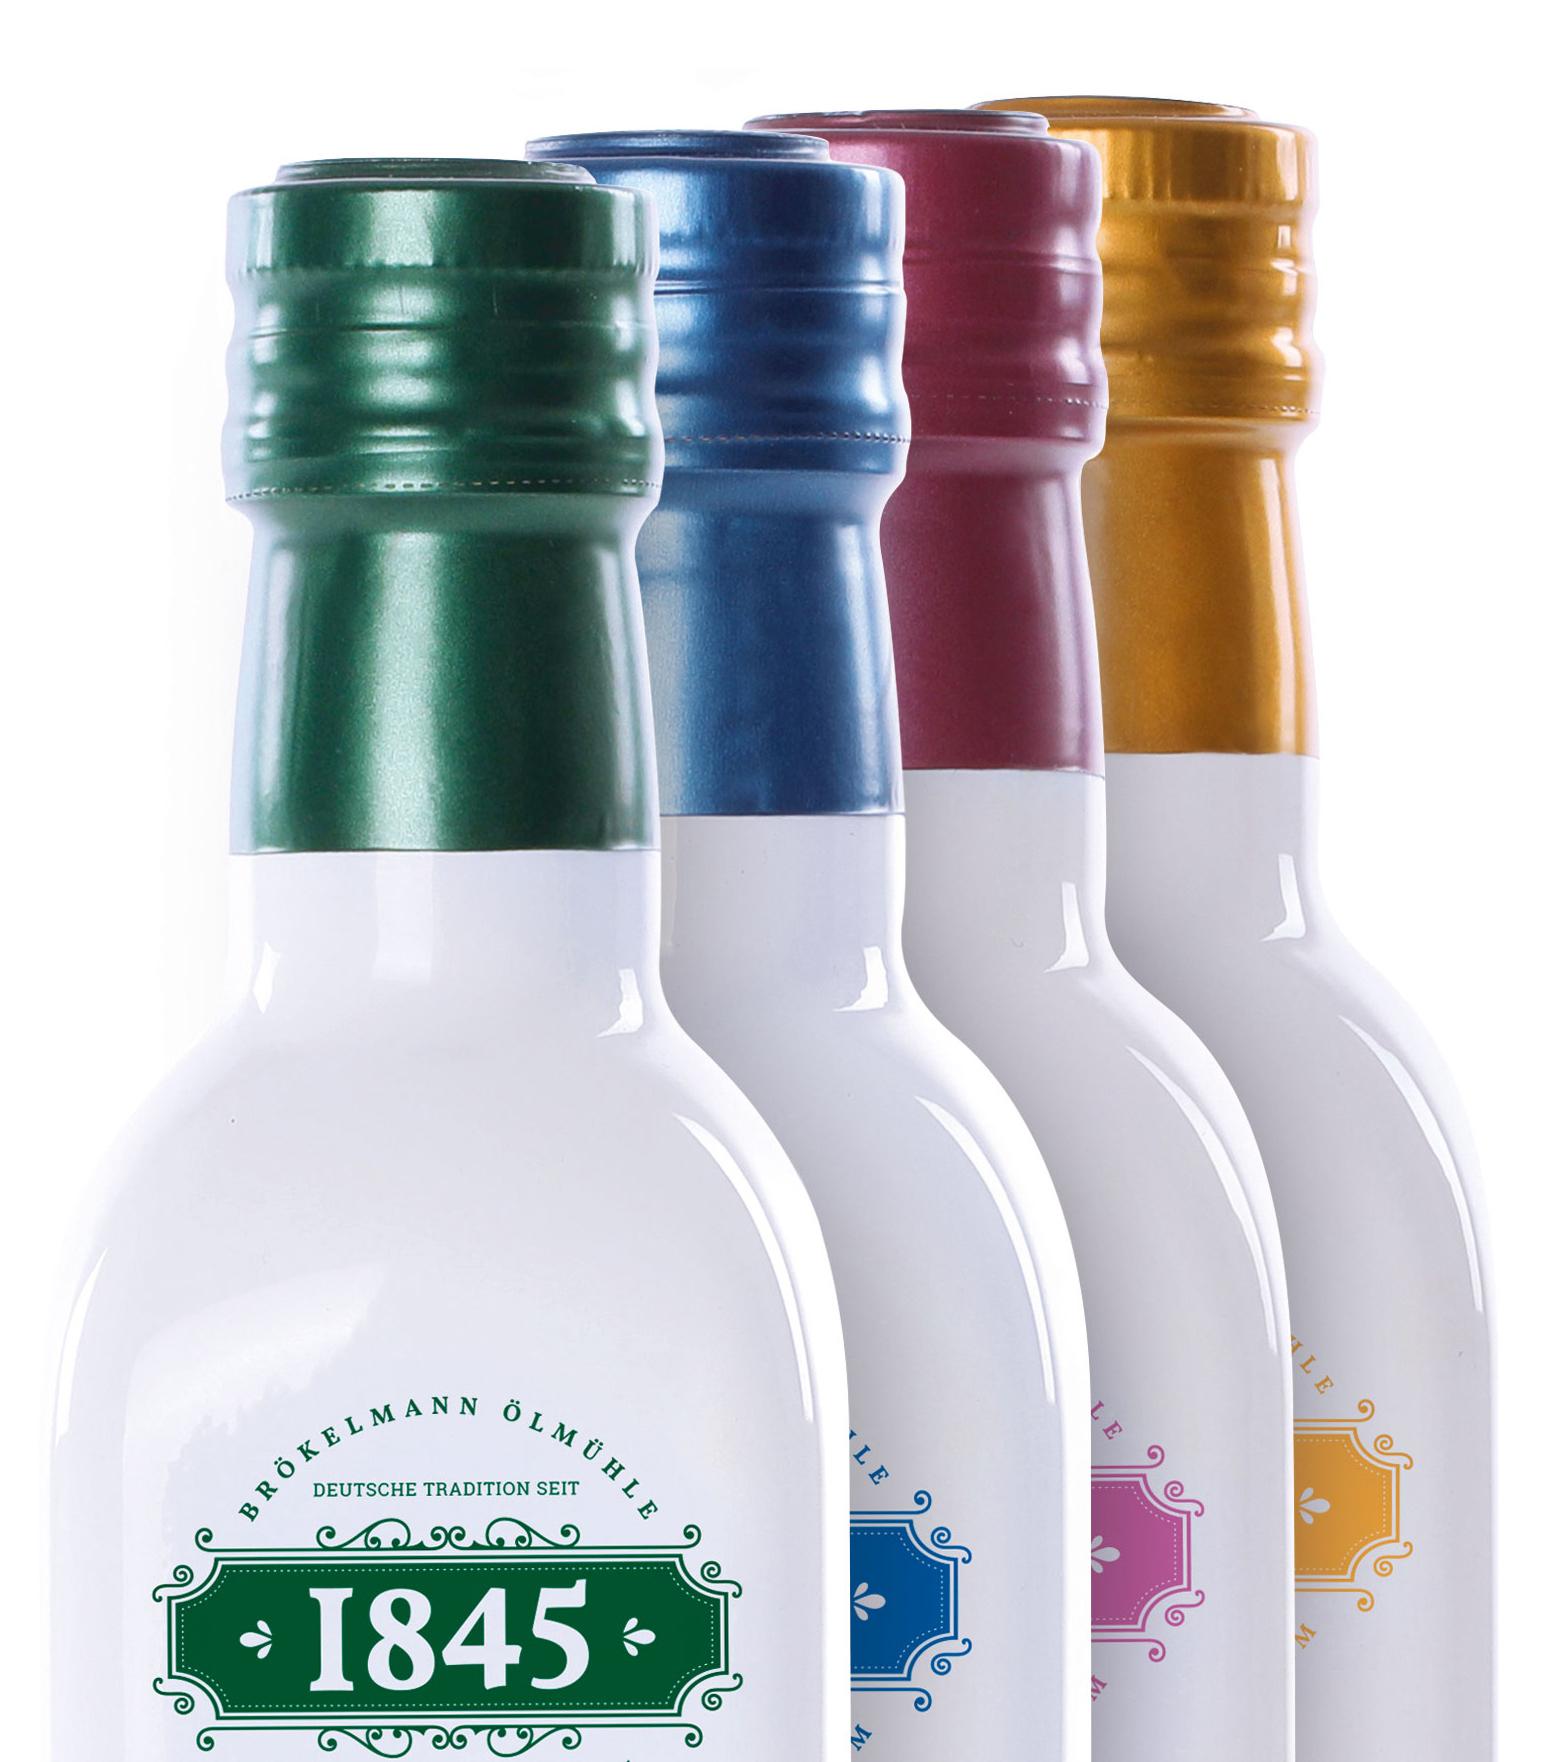 1845 Speiseöle aus Hamm Brökelmann Olmühle Rapskernöl Distel-Vitalöl Kokosrapsöl Walnussöl